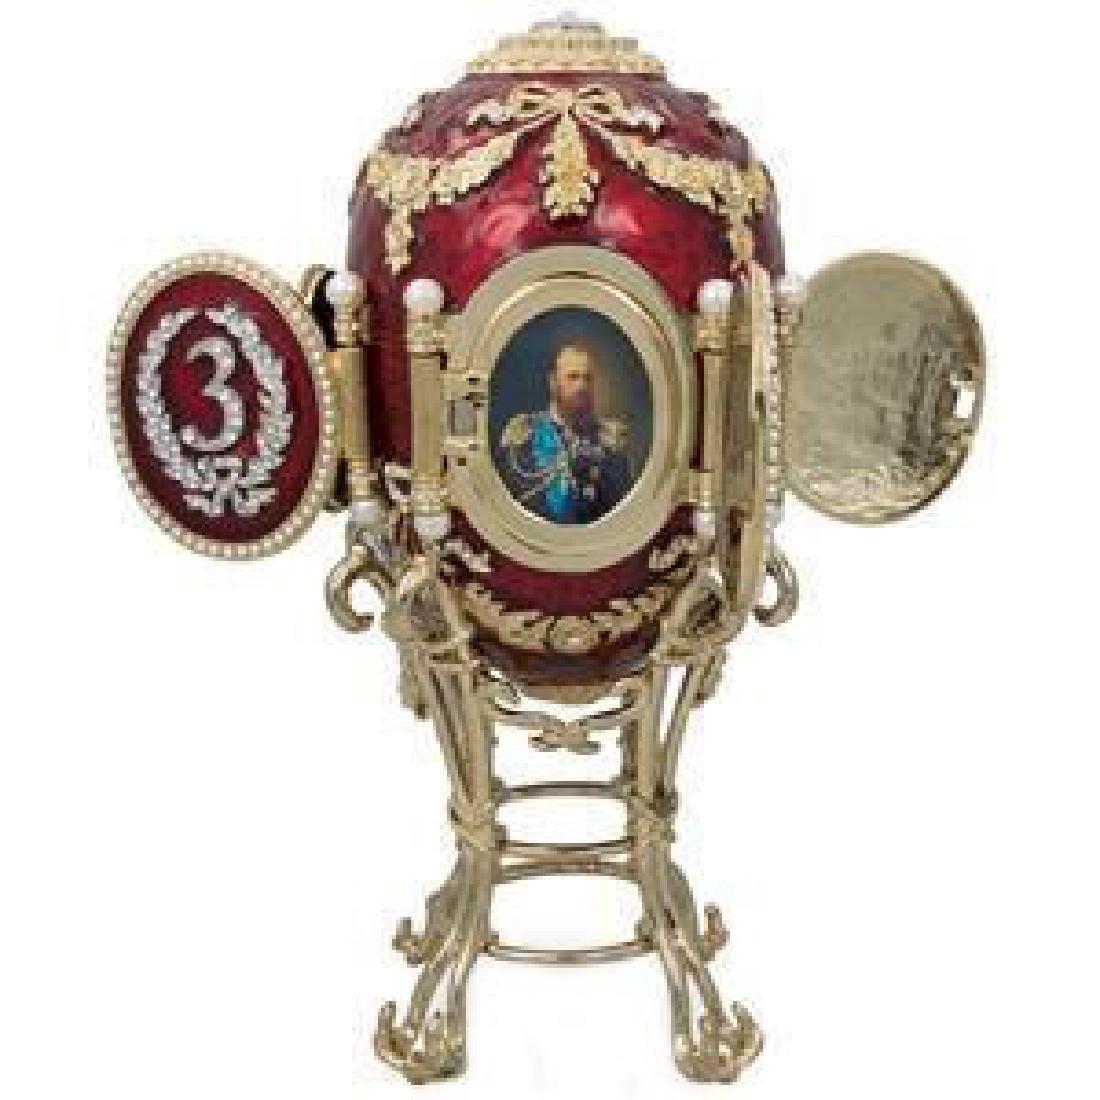 Faberge-inspired 1893 Caucasus Faberge Egg